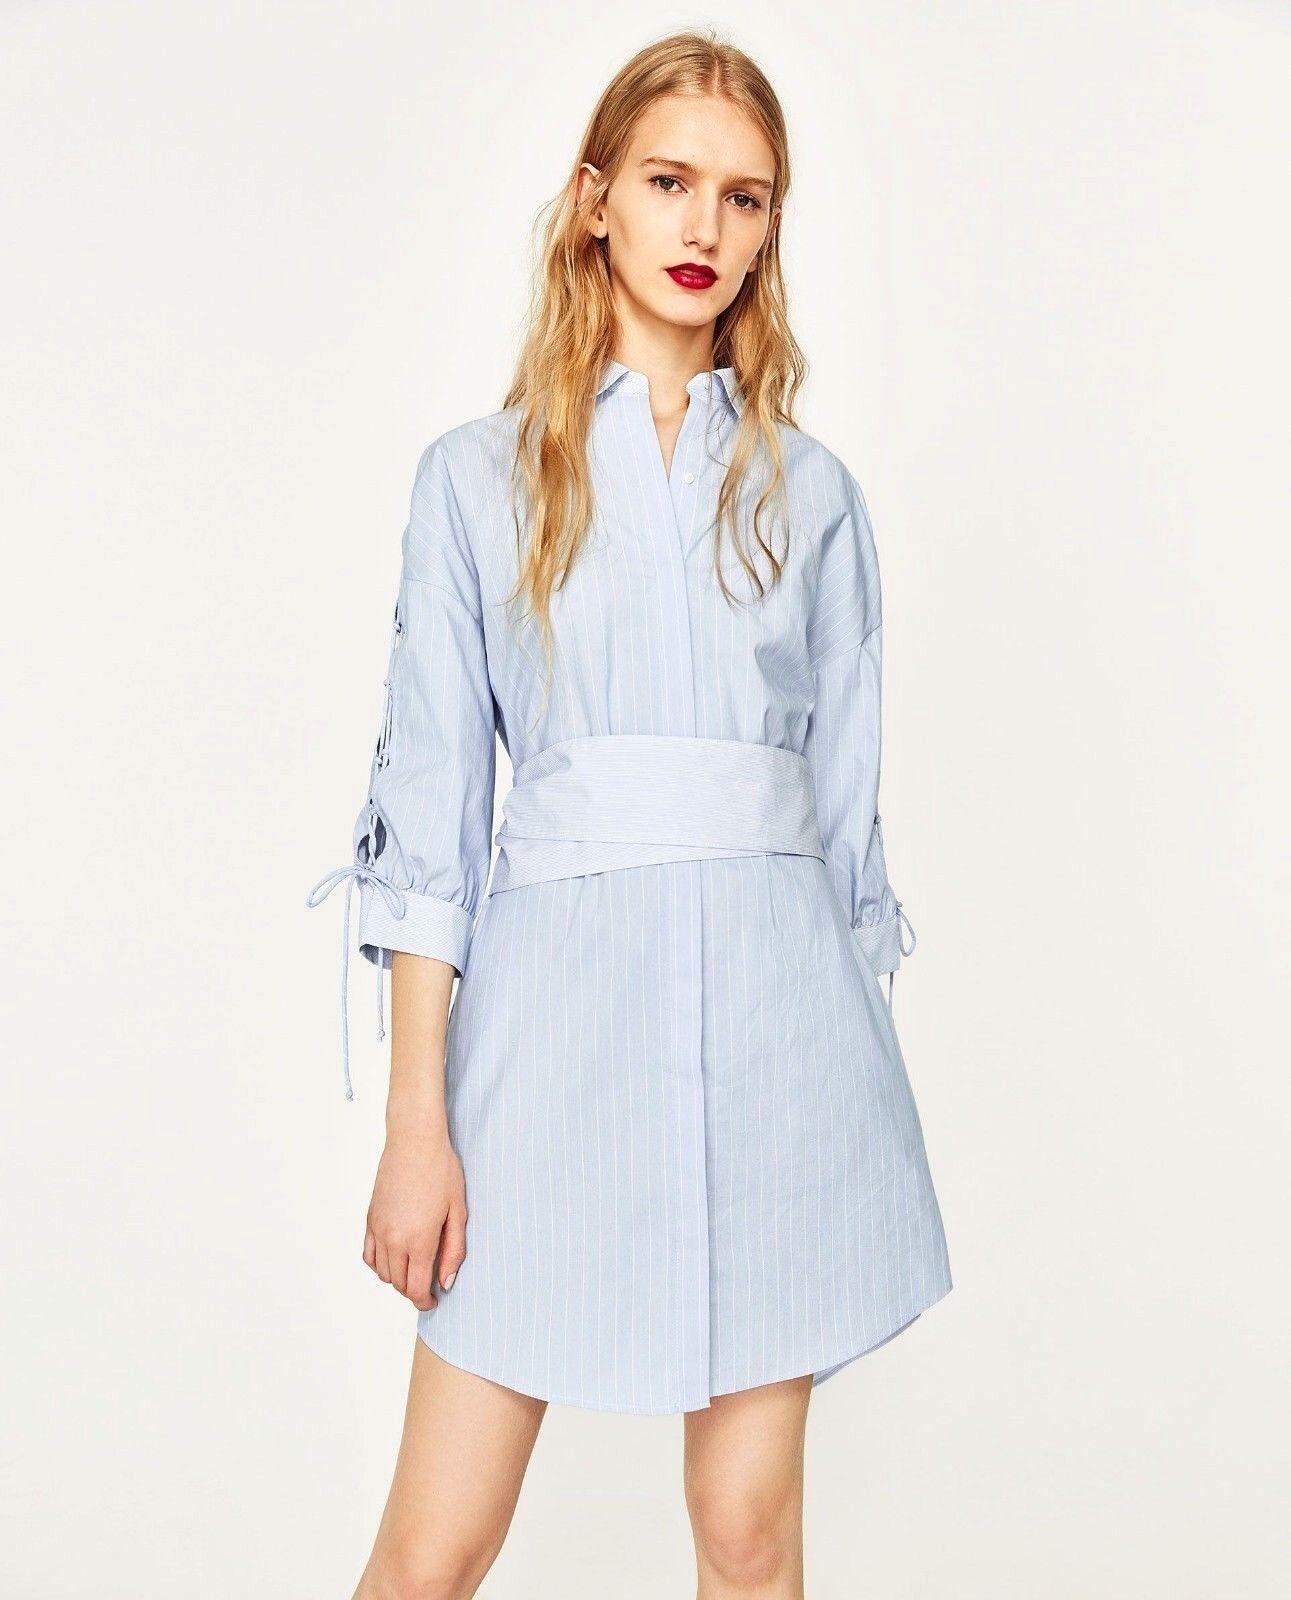 Zara Bleu Ciel Blanc Raye Xl Robe Chemise Avec Ceinture Taille Xl